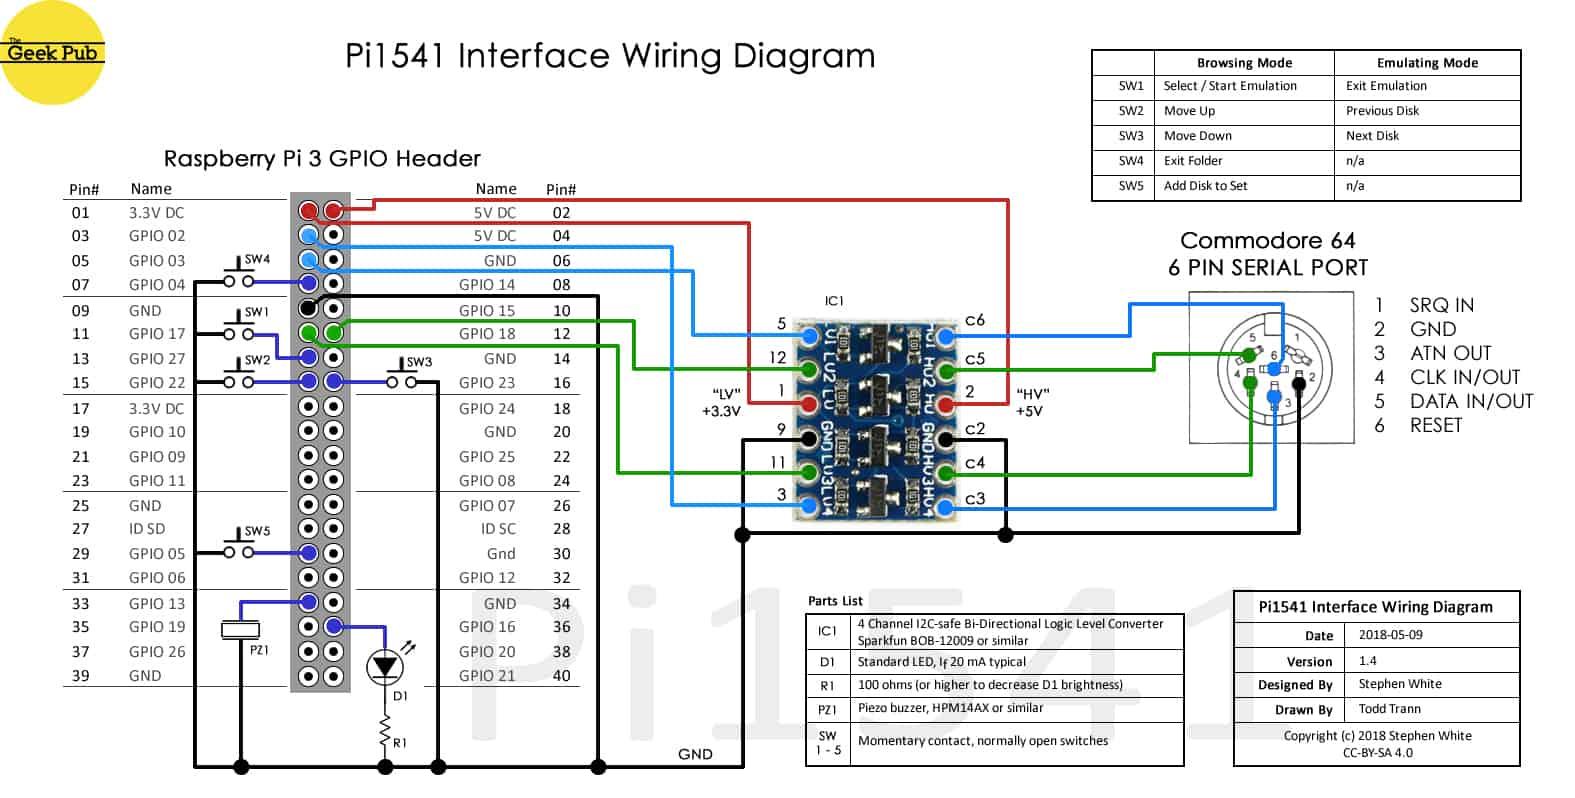 Pi1541 schematic